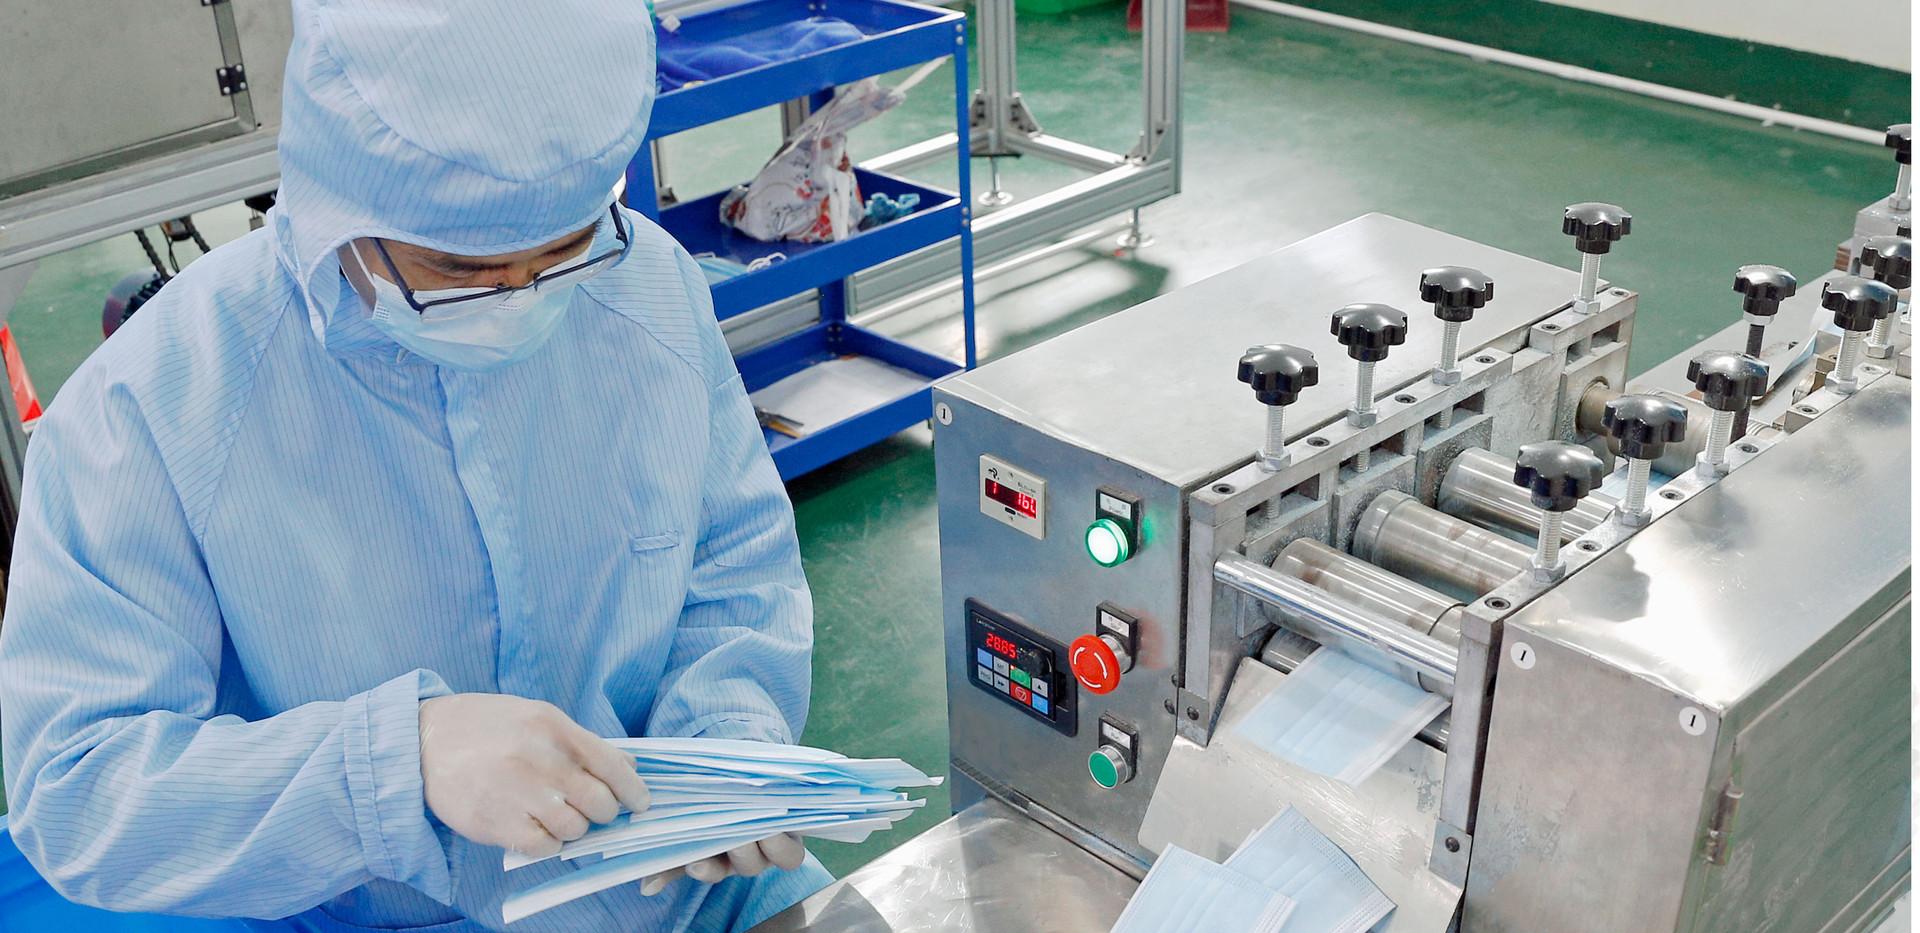 3 Ply Disposable Mask Prodution